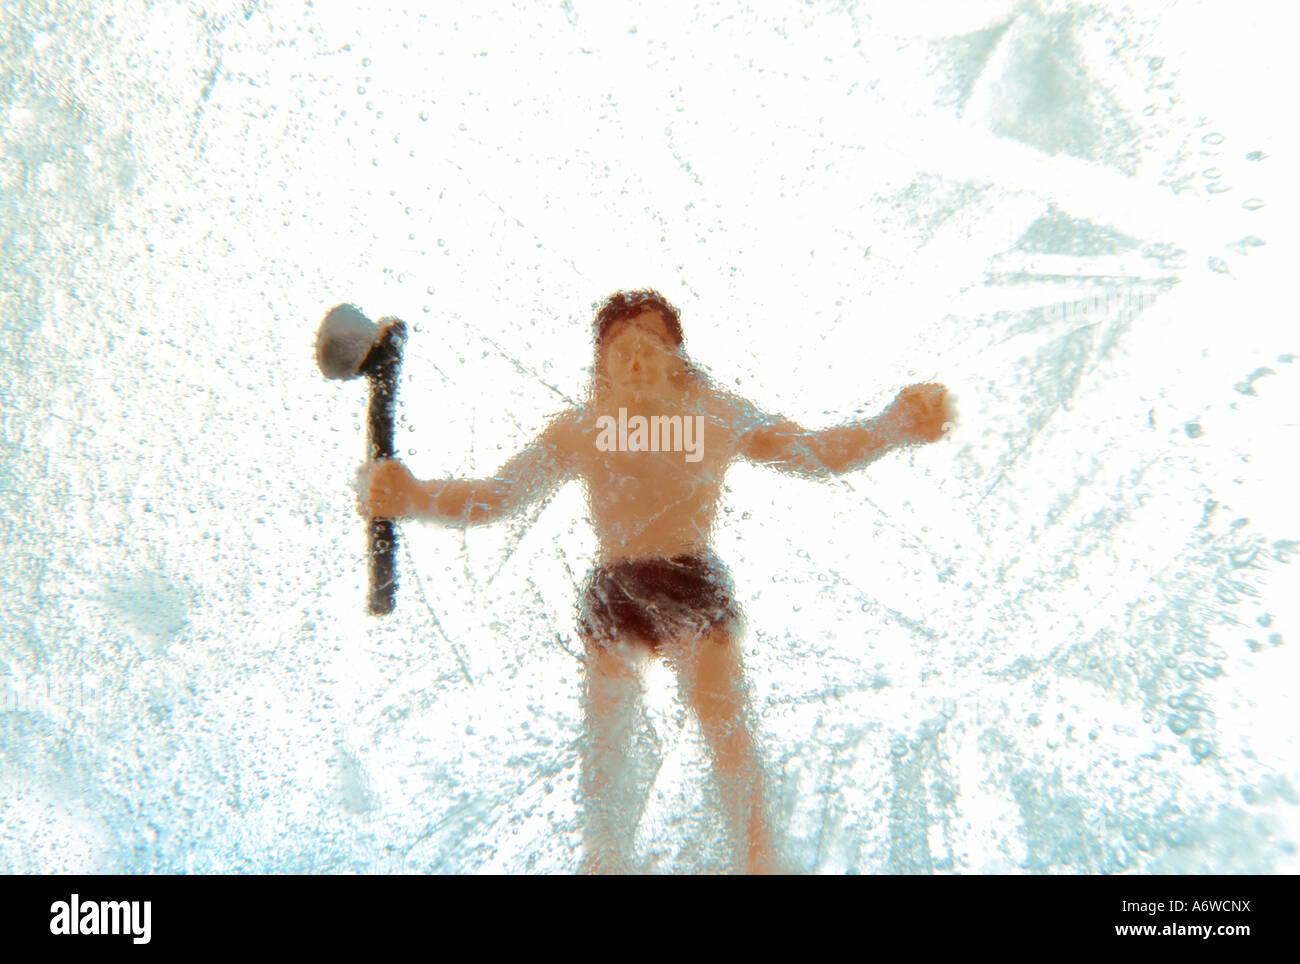 Frozen Toy Caveman - Stock Image